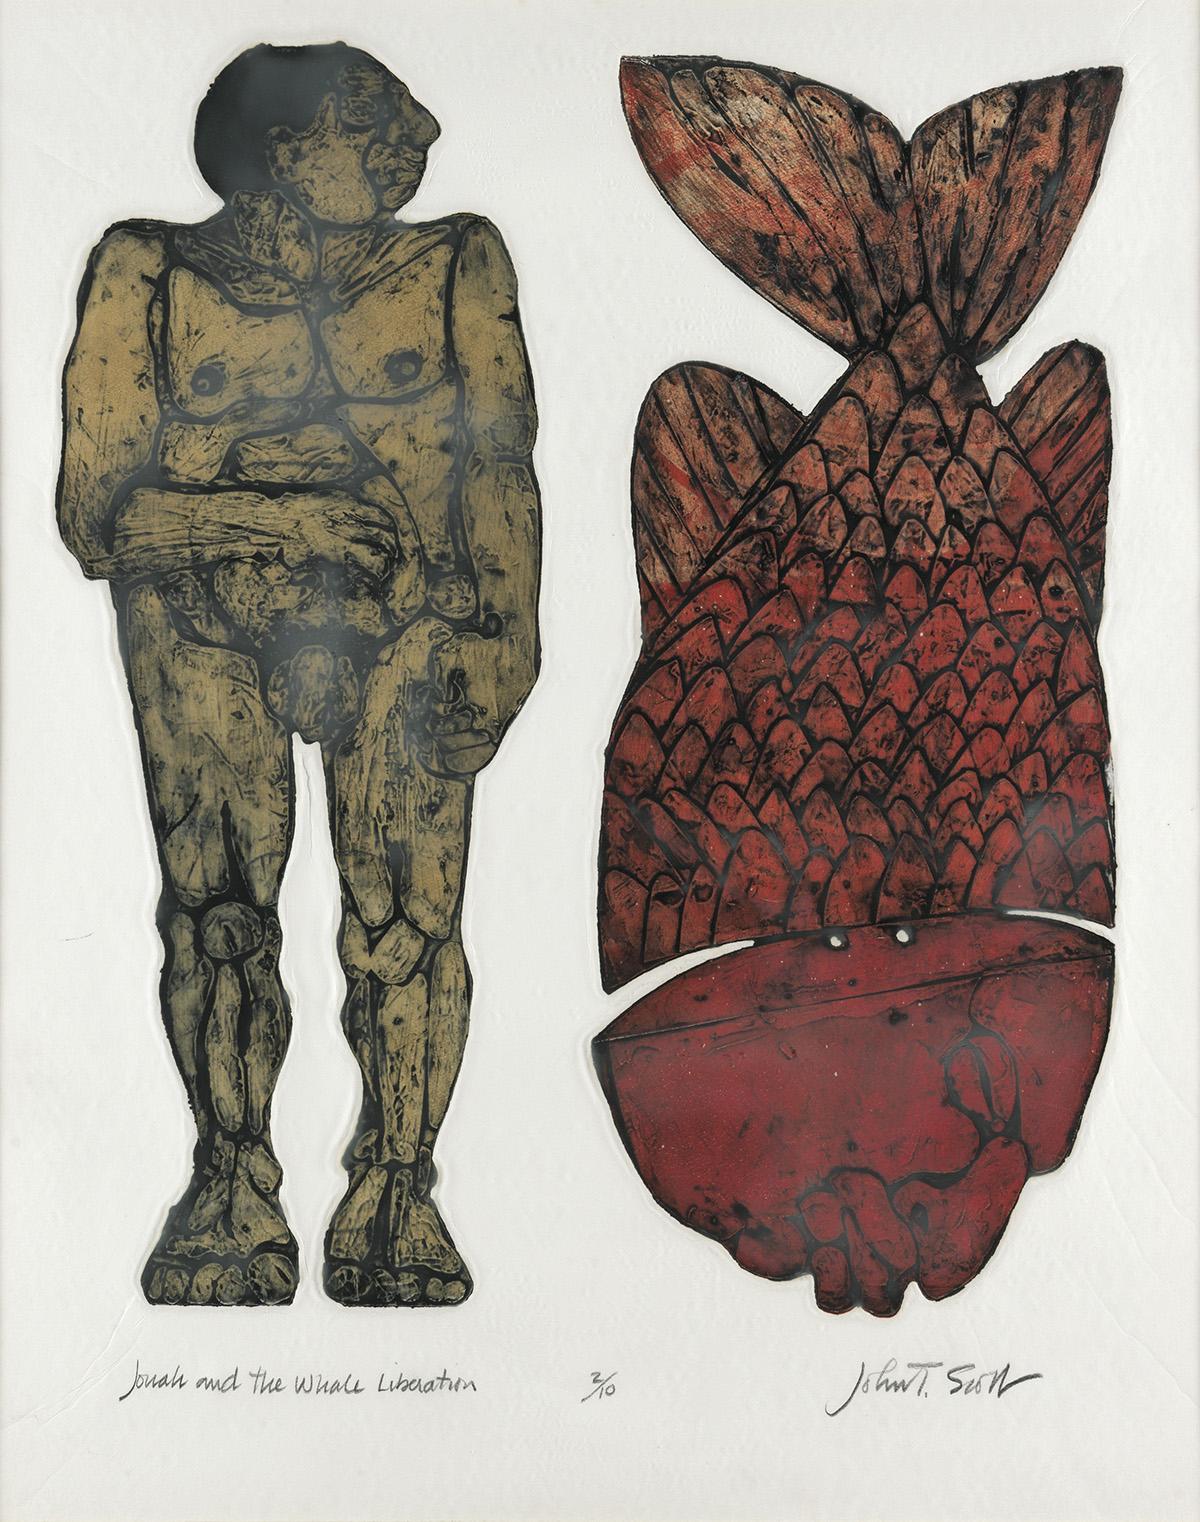 JOHN TARRELL SCOTT (1940 - 2007) Jonah and the Whale - Liberation.